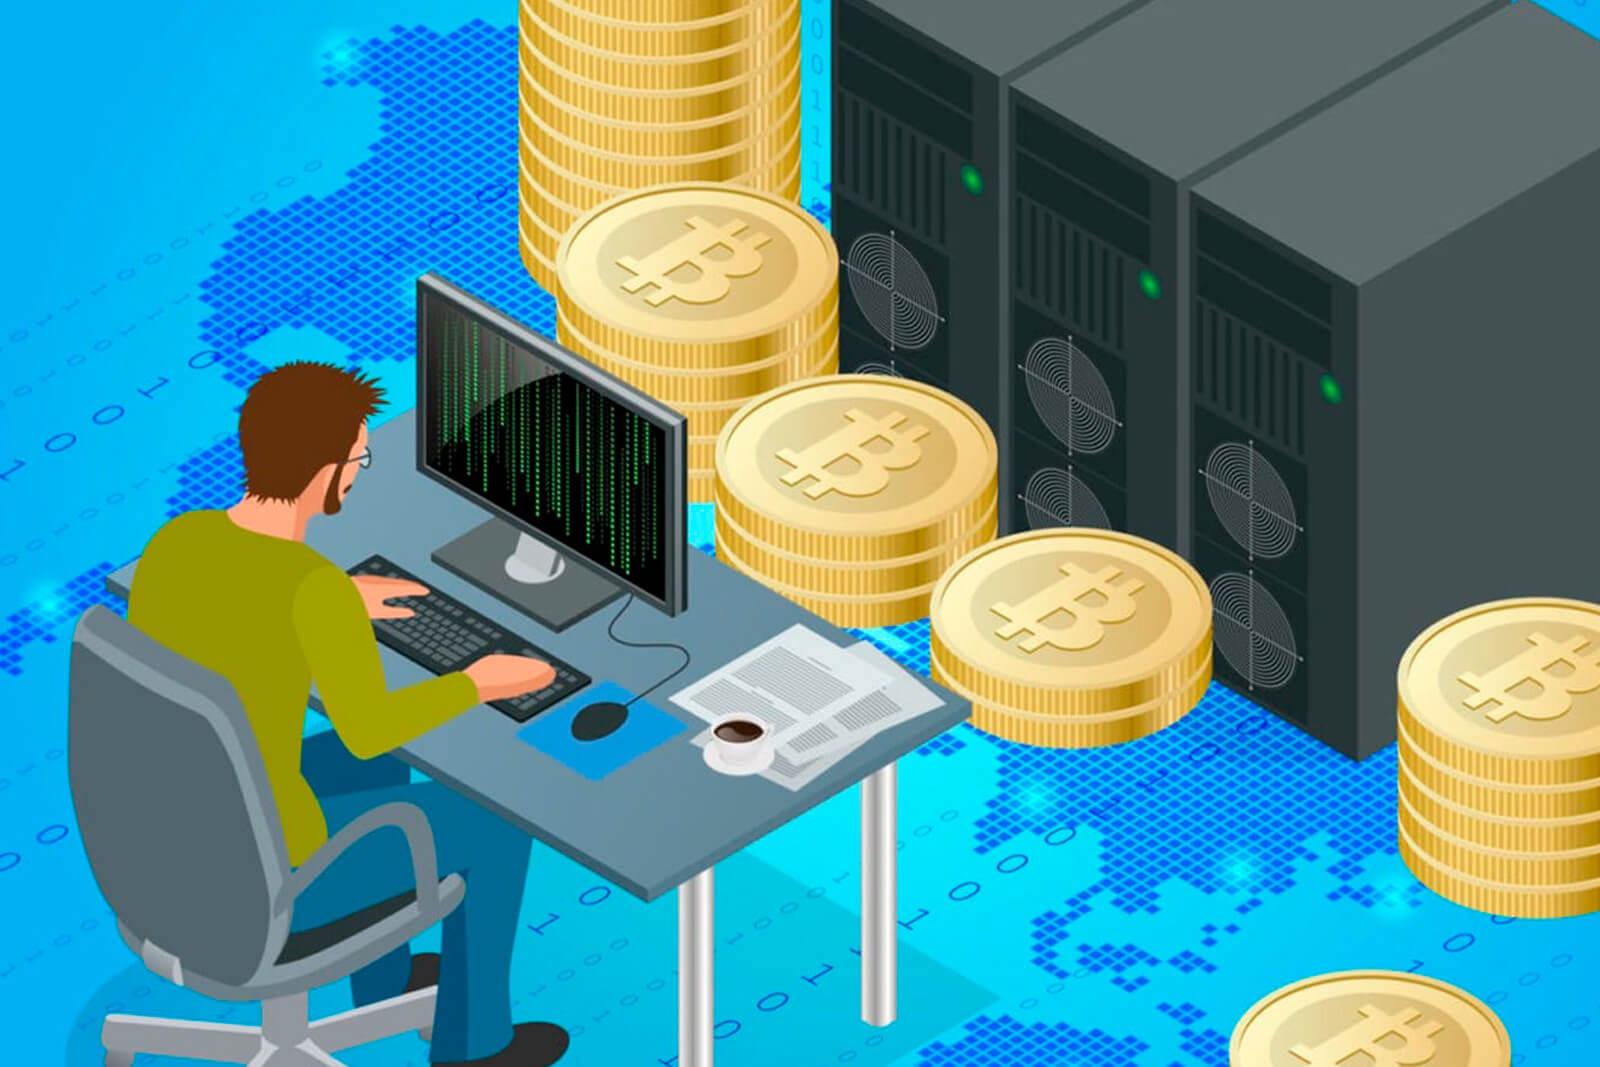 Где берут криптовалюту?